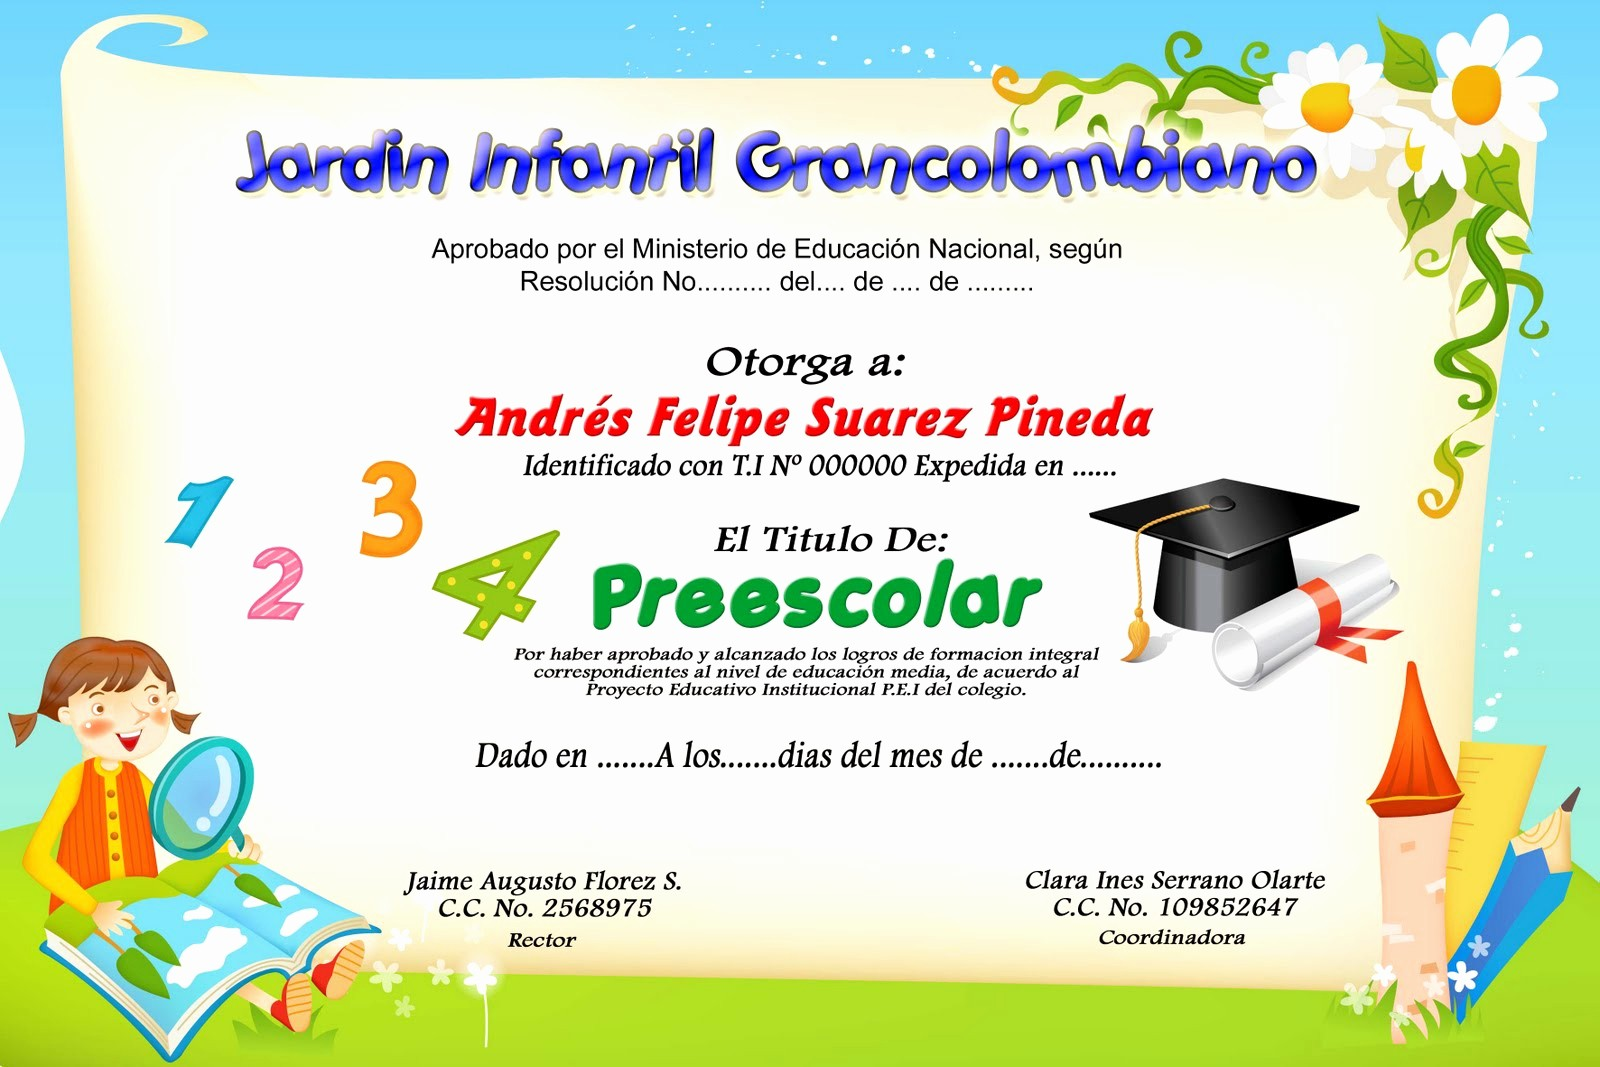 Diplomas Para Imprimir Y Editar Best Of Diplomas Y Mosaicos Escolares Diplomas Y Mosaicos Preescolar